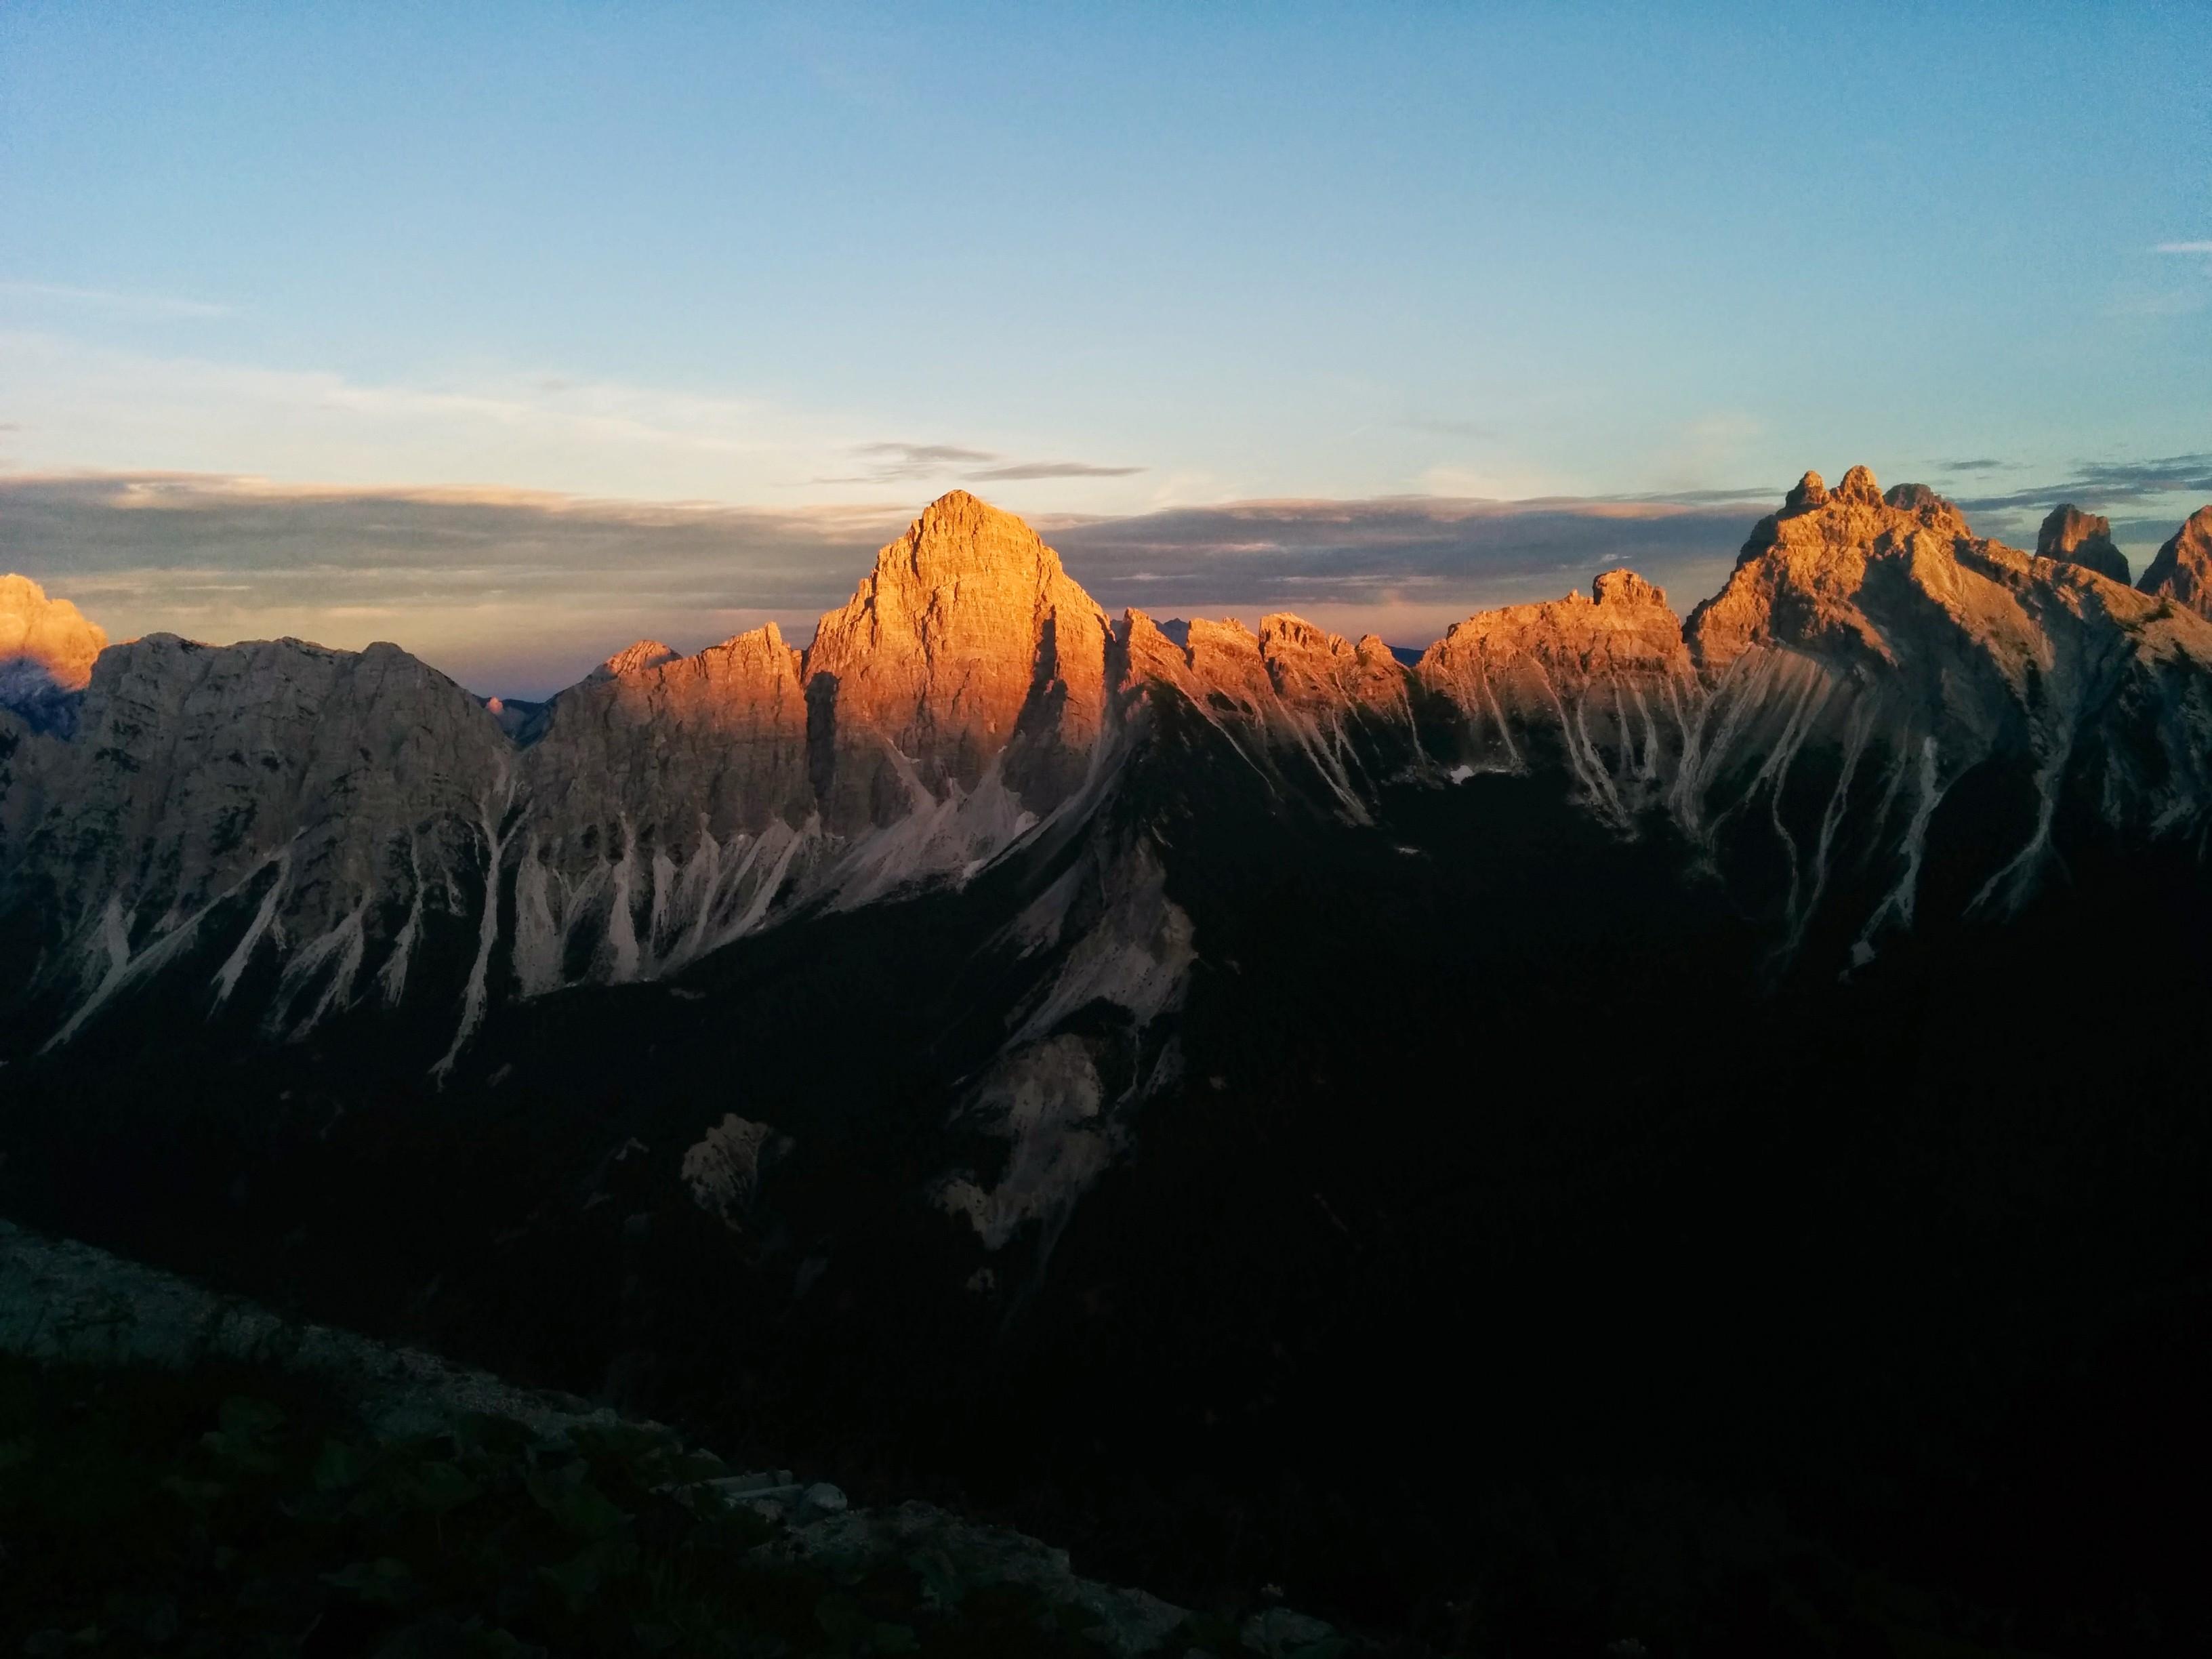 Trekking Alta Via n 3 in Dolomiti